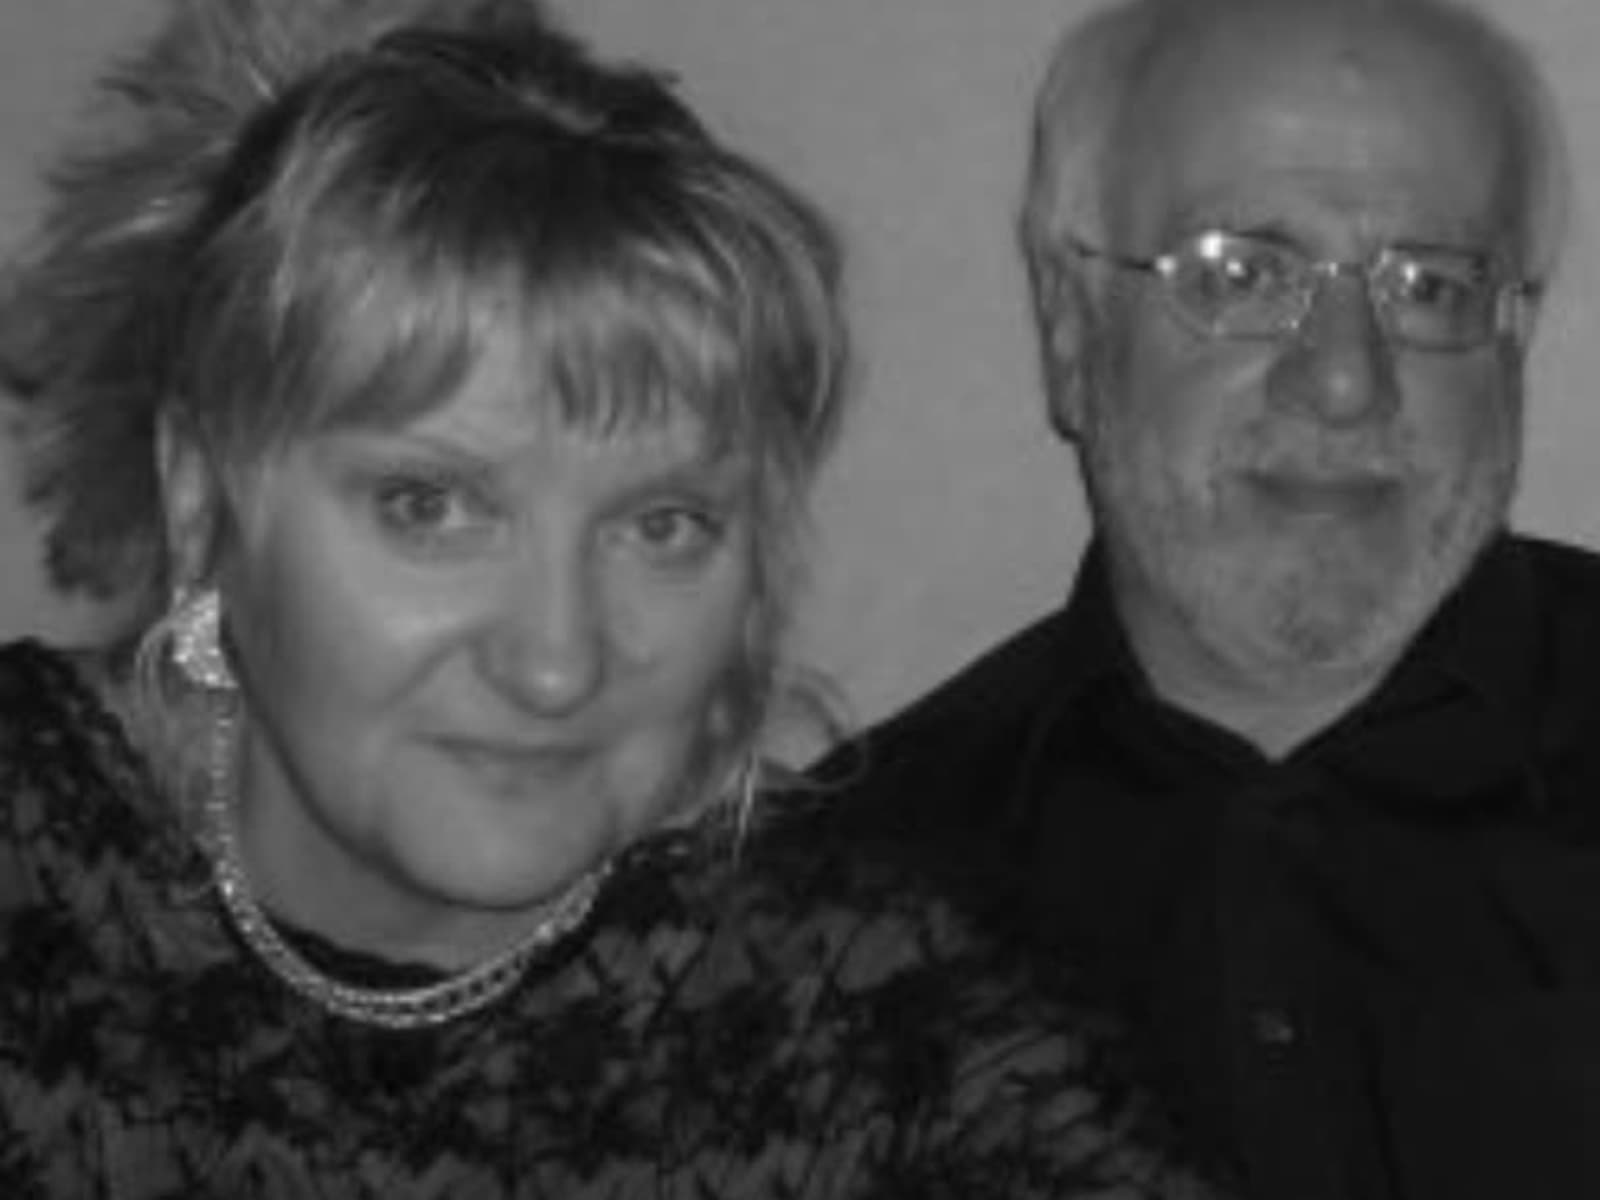 Enid & Steve from Glossop, United Kingdom